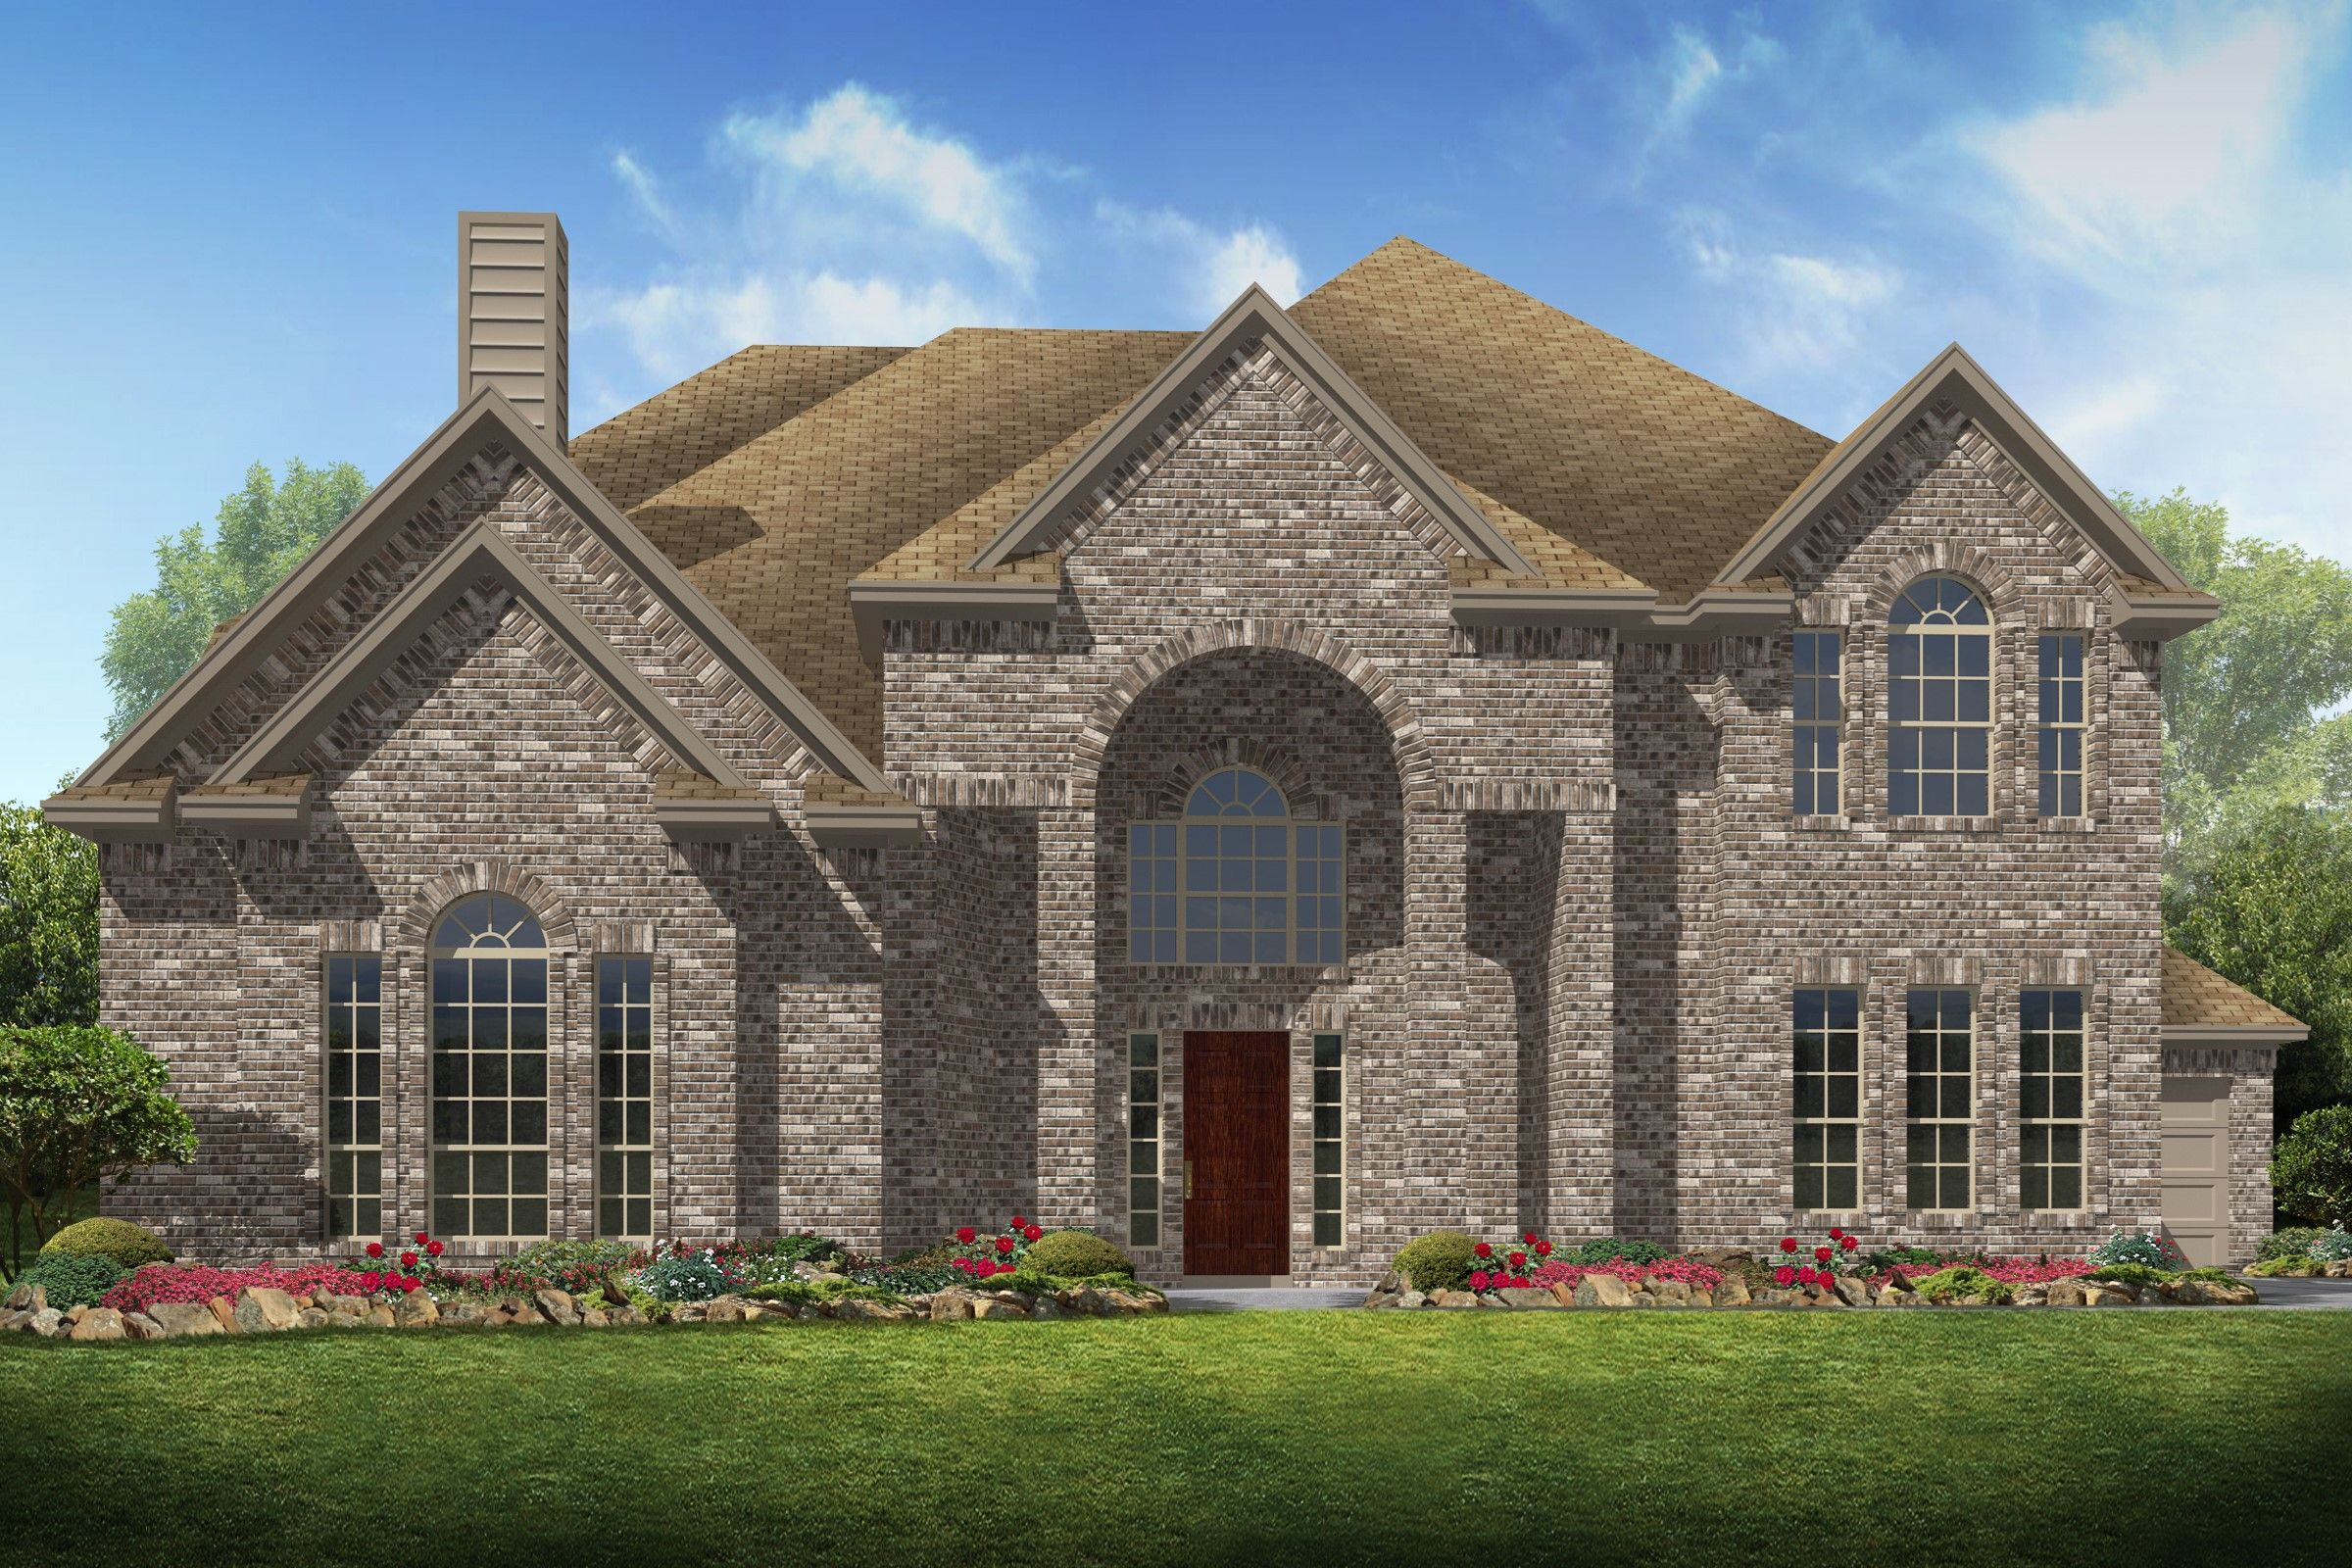 Single Family for Sale at Sellers Station - Briarwood 6218 Sundown Lane Baytown, Texas 77523 United States